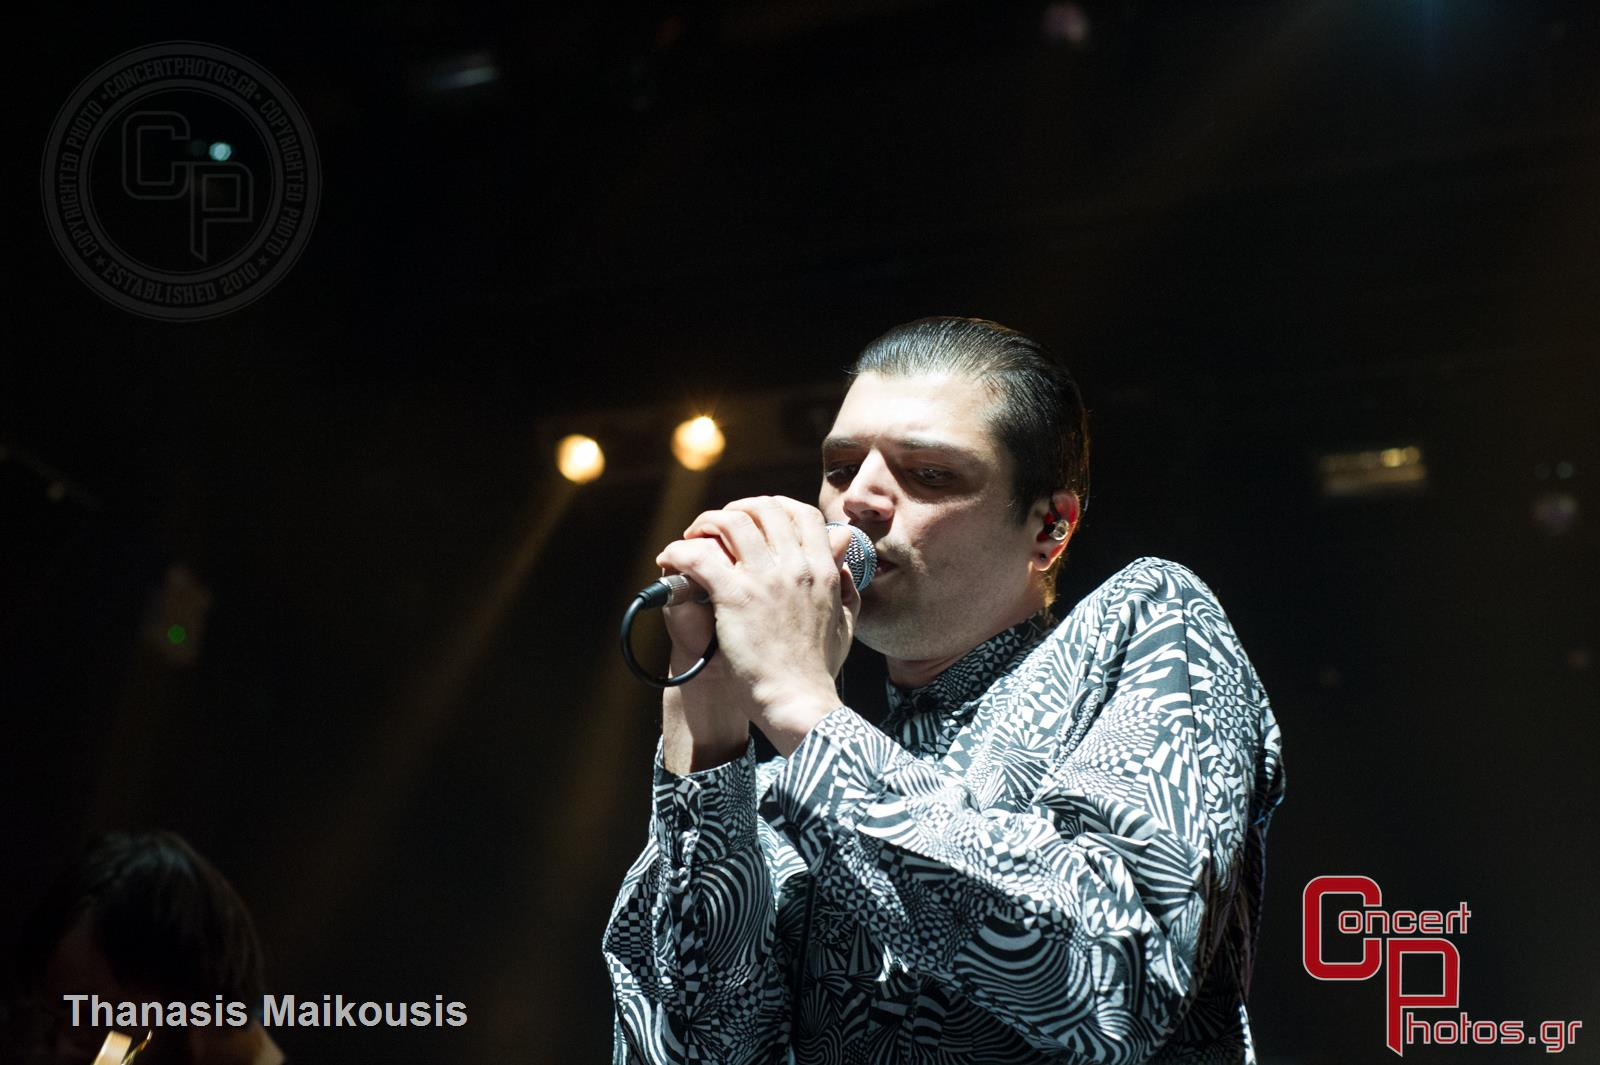 Tricky - Spectralfire-Tricky - Spectralfire photographer: Thanasis Maikousis - concertphotos_-3583